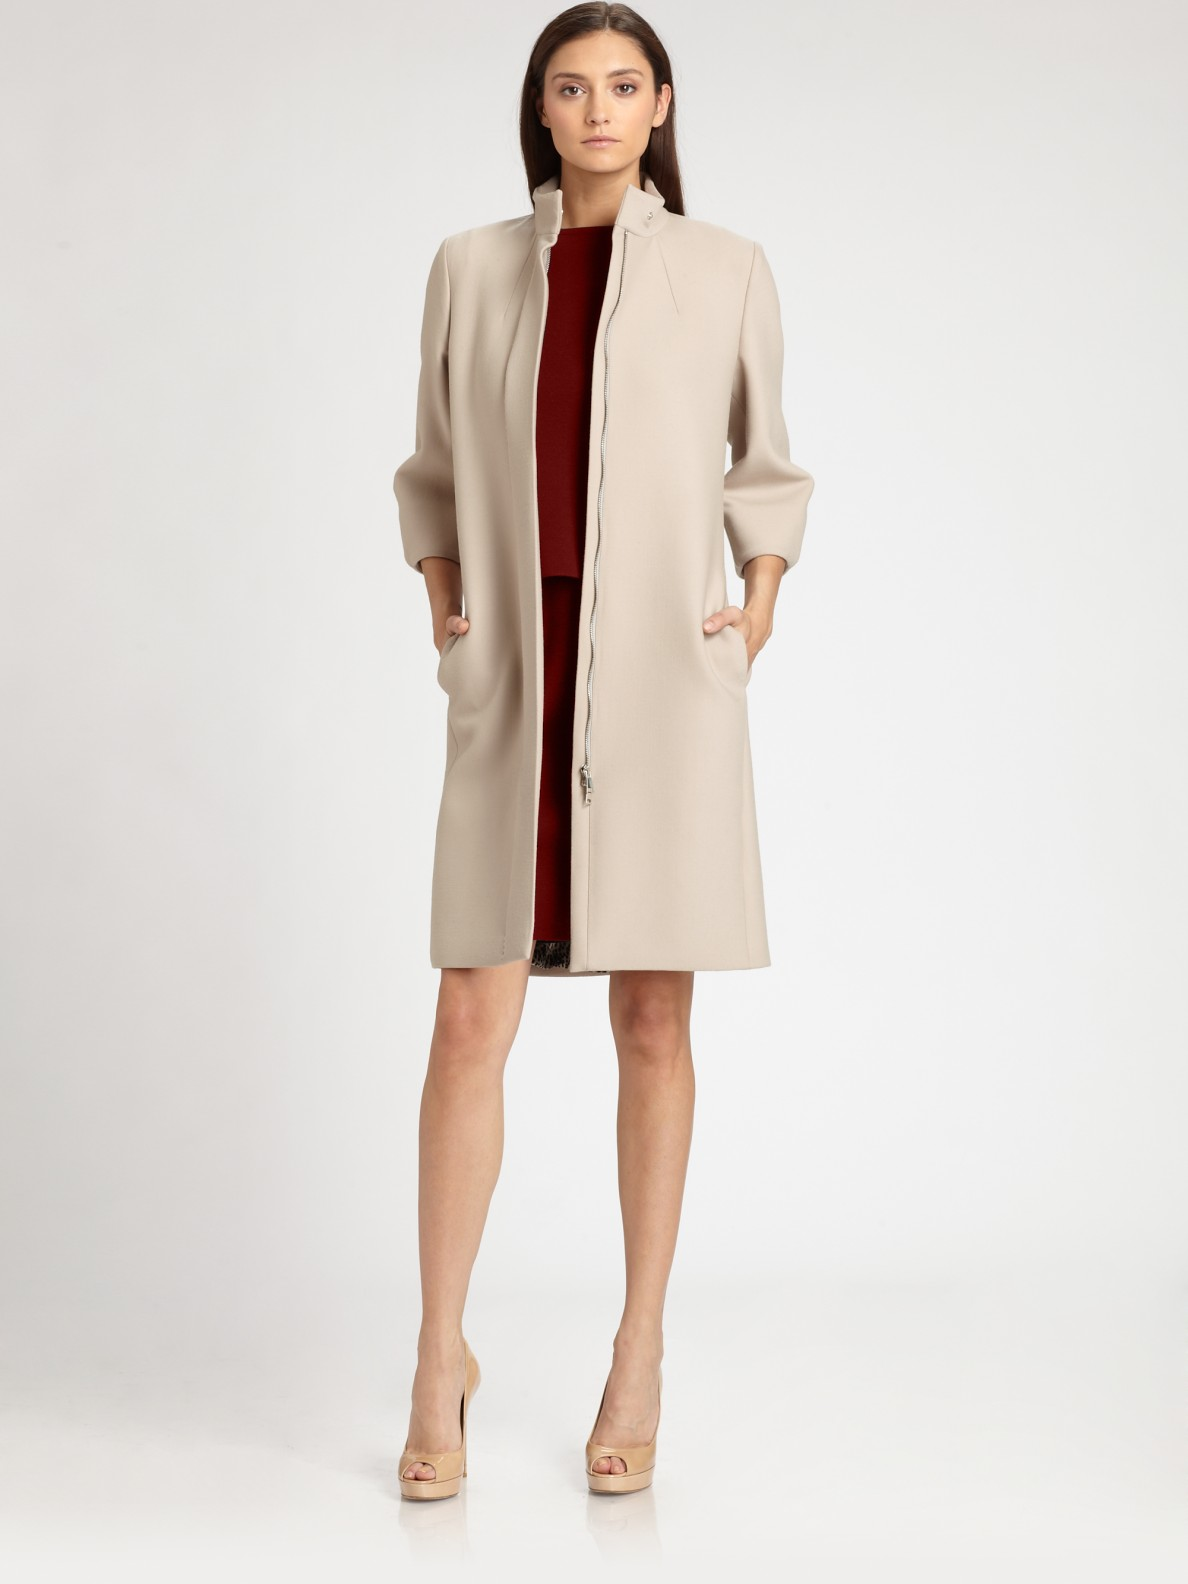 max mara wool coat in beige lyst. Black Bedroom Furniture Sets. Home Design Ideas